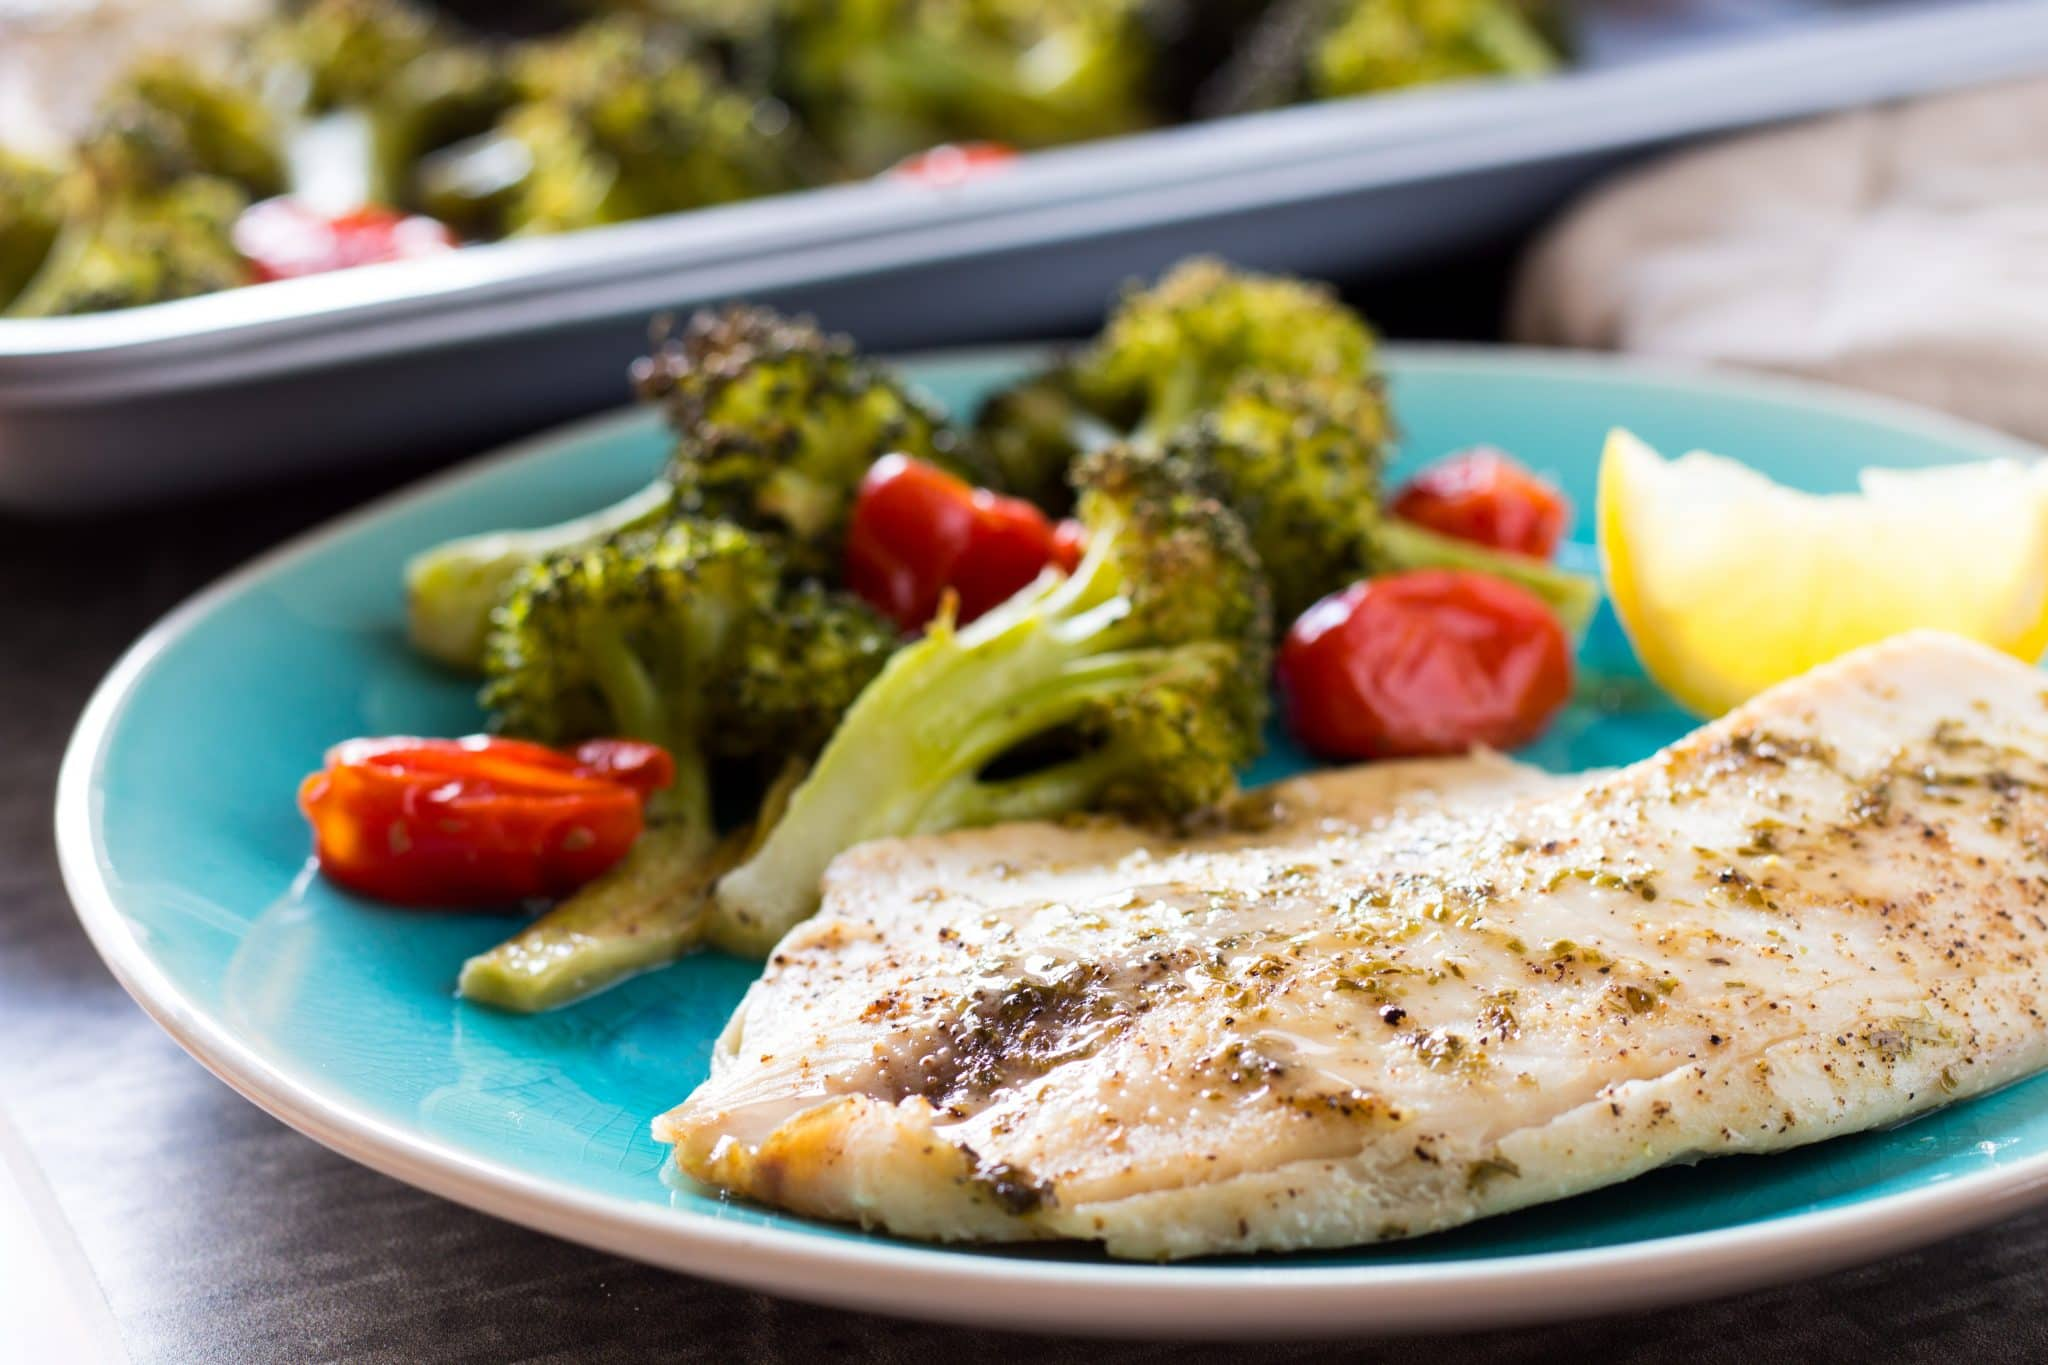 Roasted Tilapia & Broccoli Sheet Pan Dinner